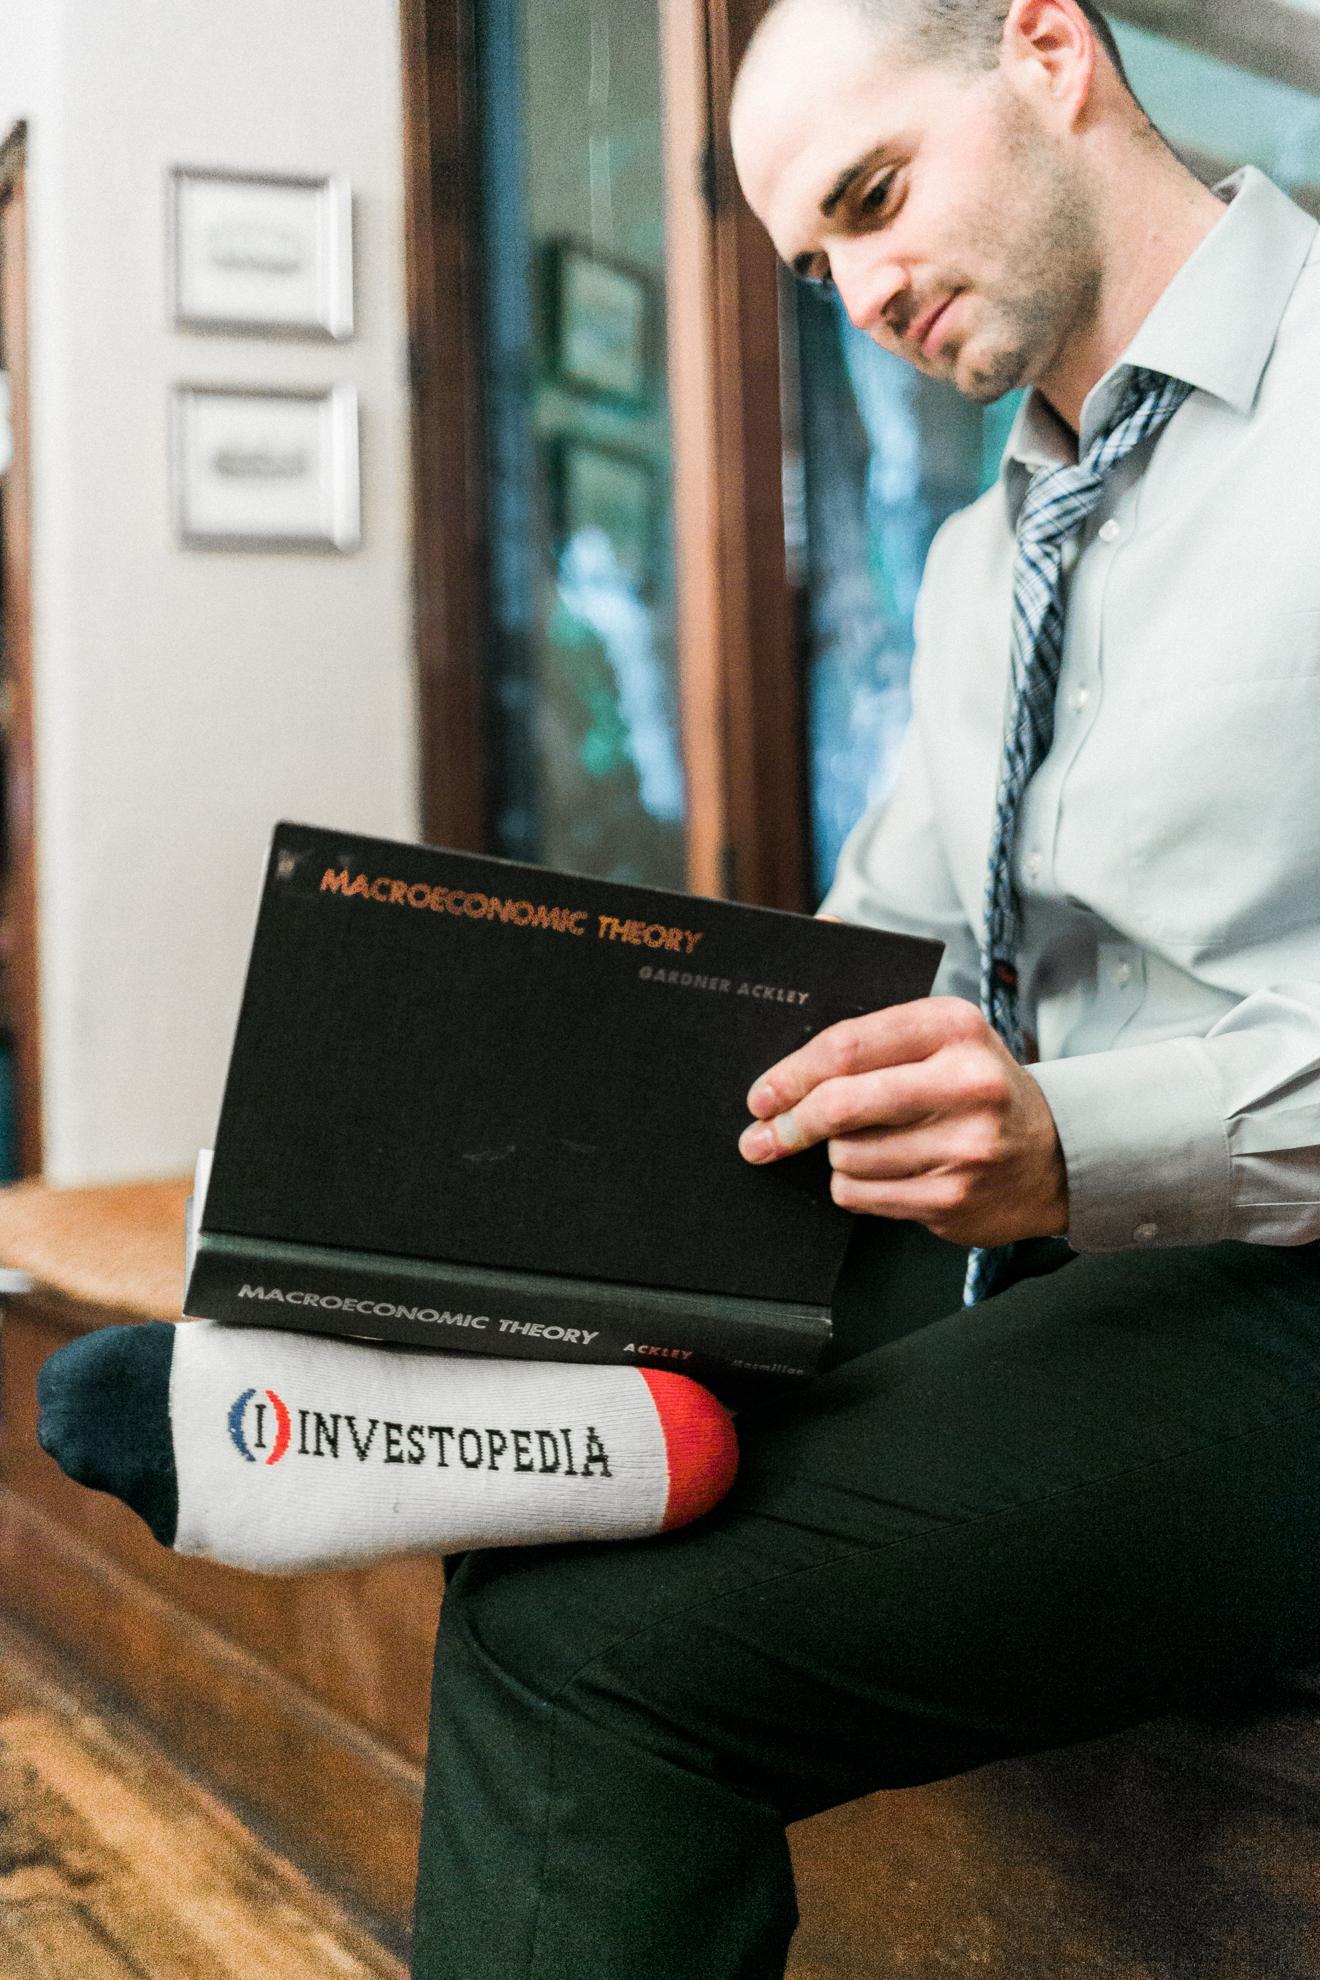 Rischall, Stephen Investopedia socks.jpg